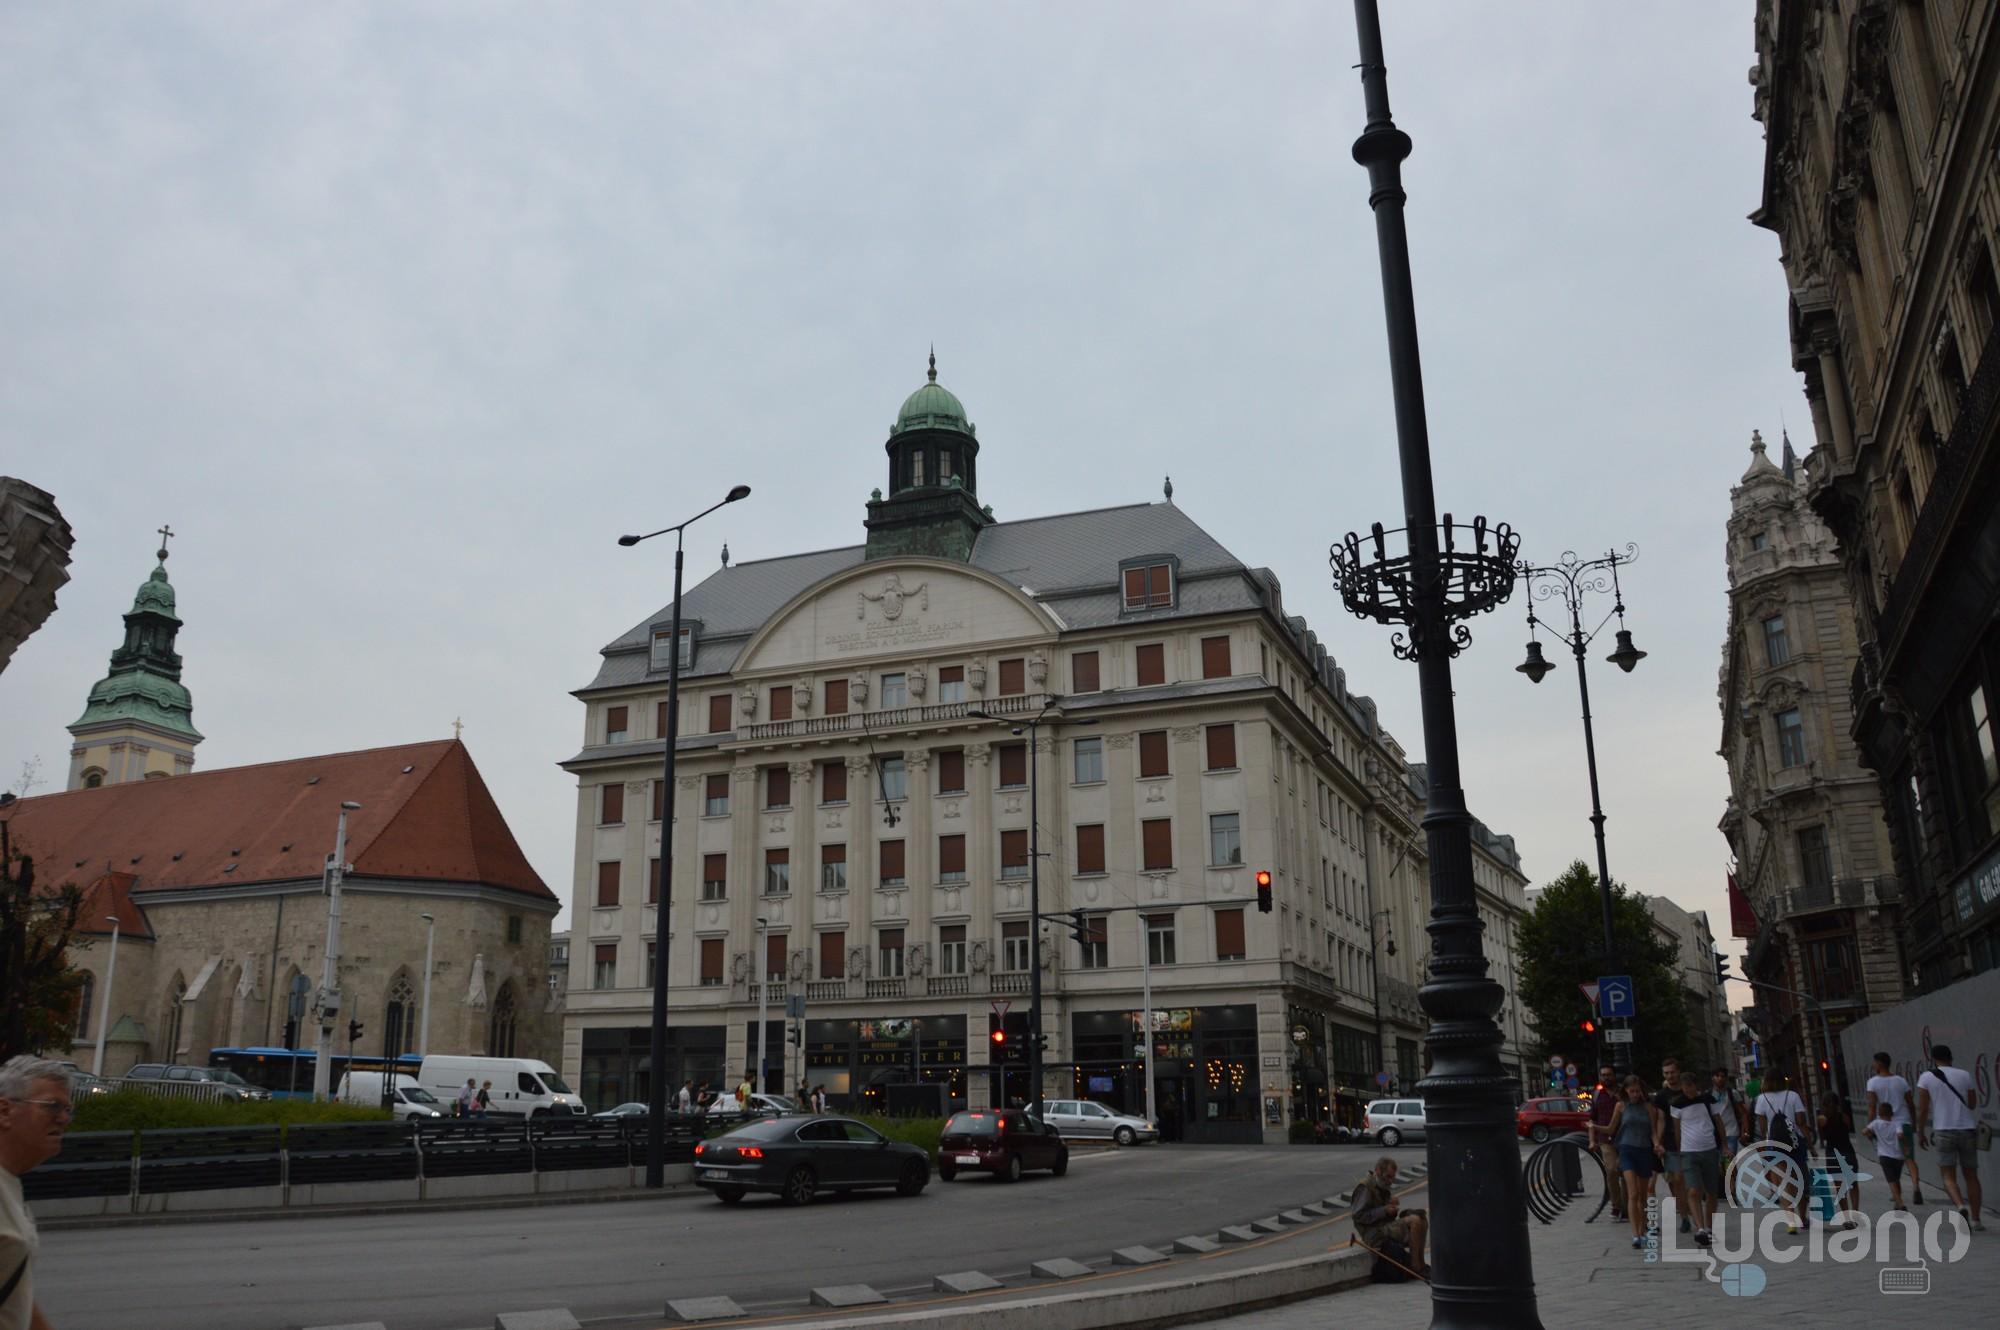 budapest-luciano-blancato (345)